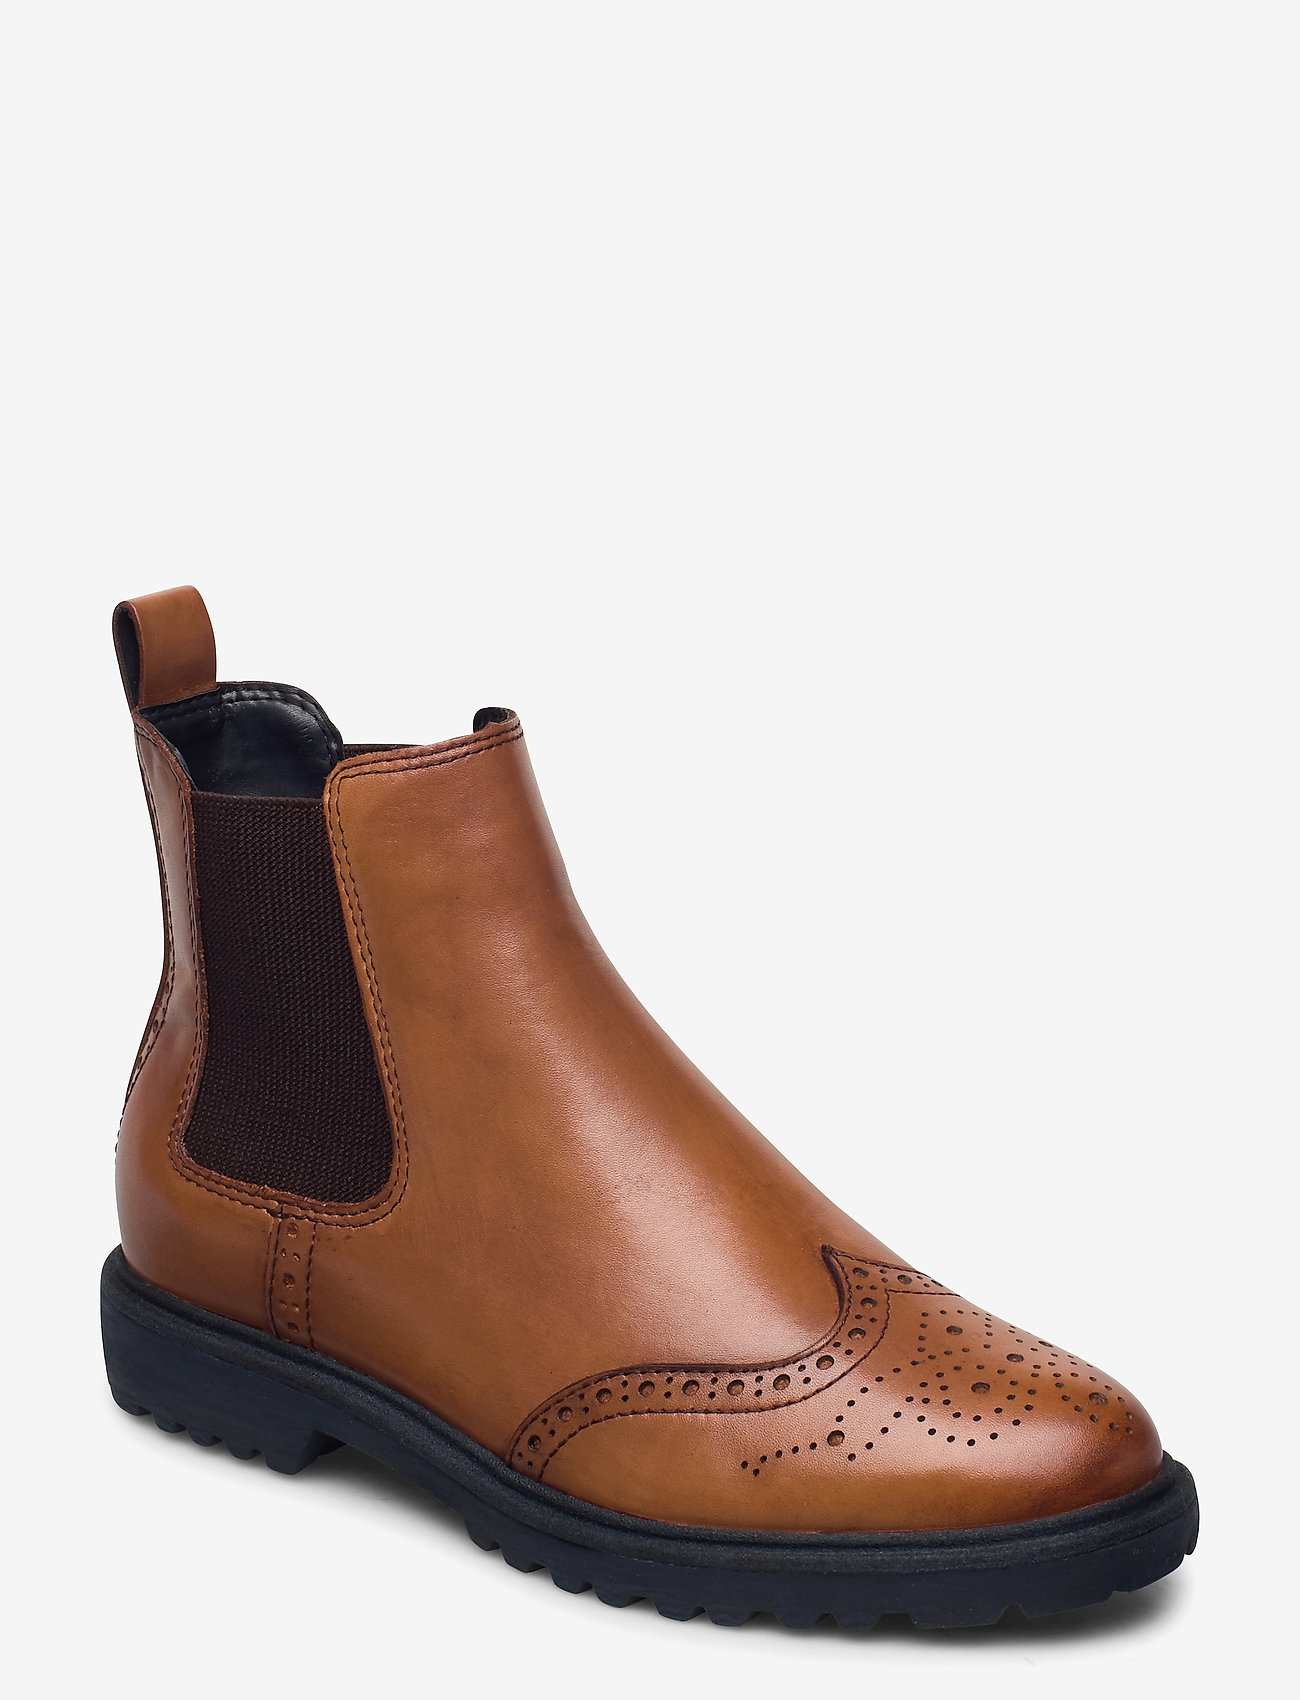 Tamaris - Woms Boots - chelsea boots - cognac leather - 0